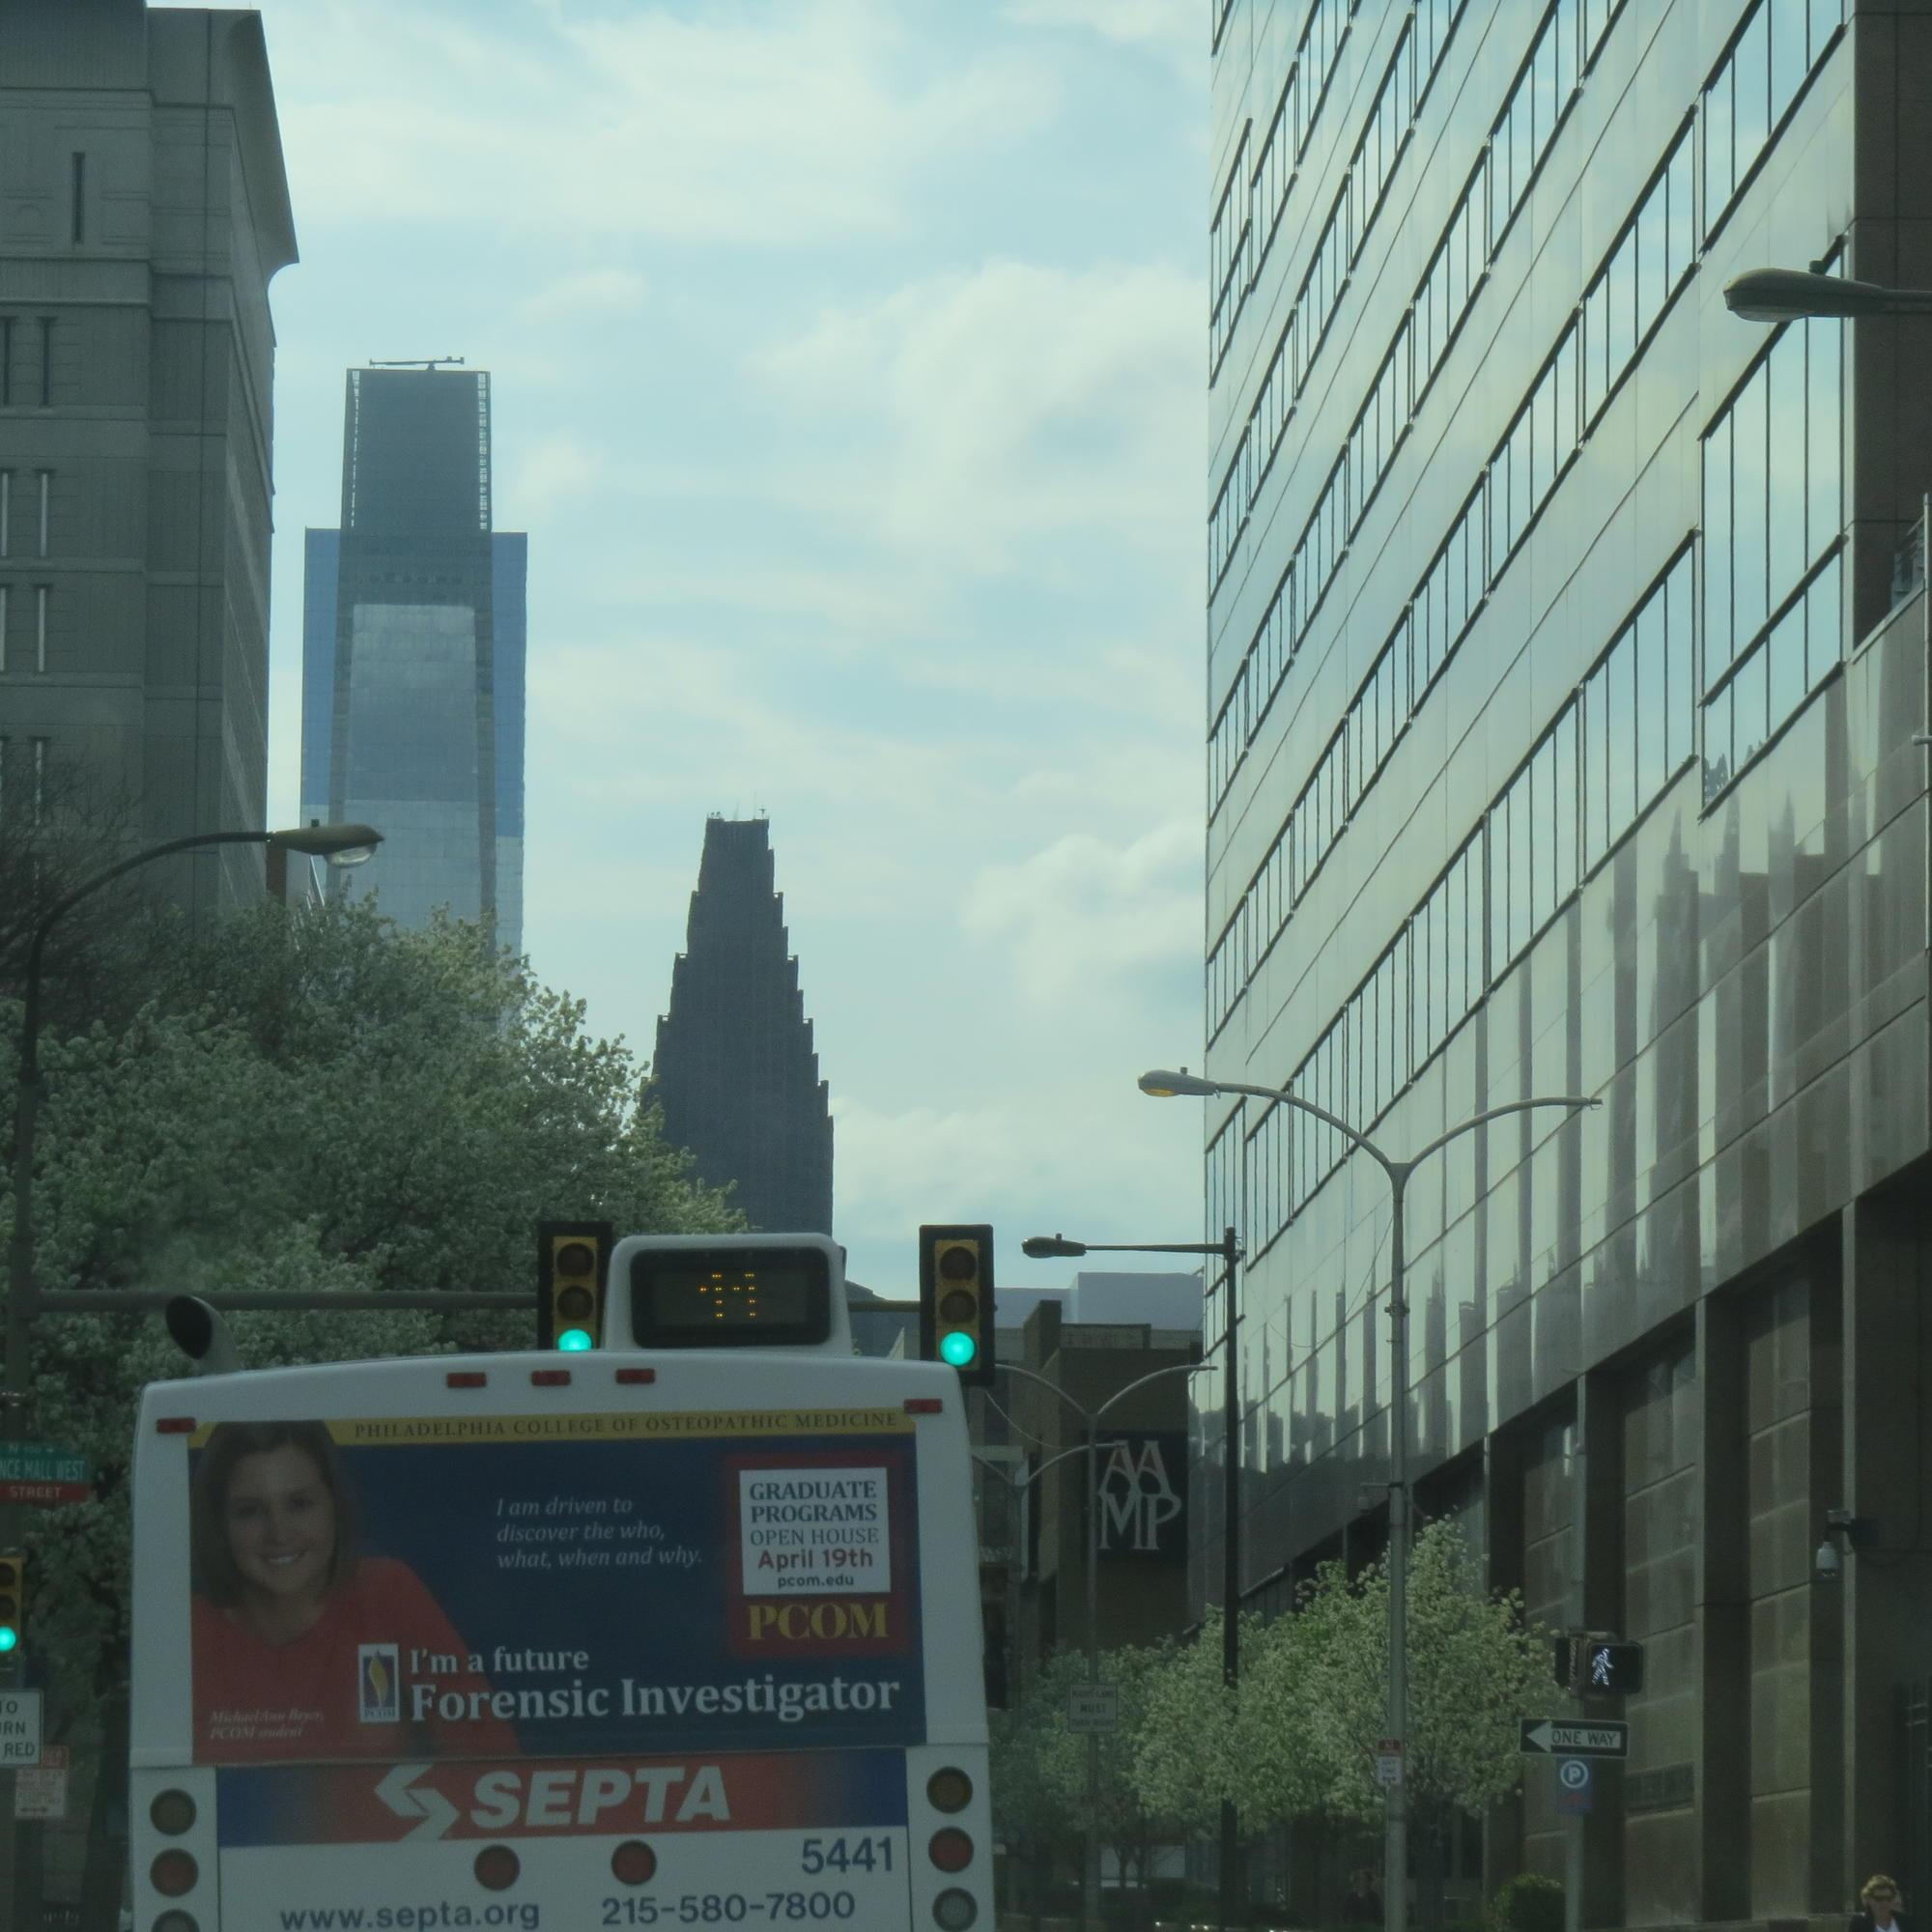 Philadelphia city data dating site:www.city-data.com